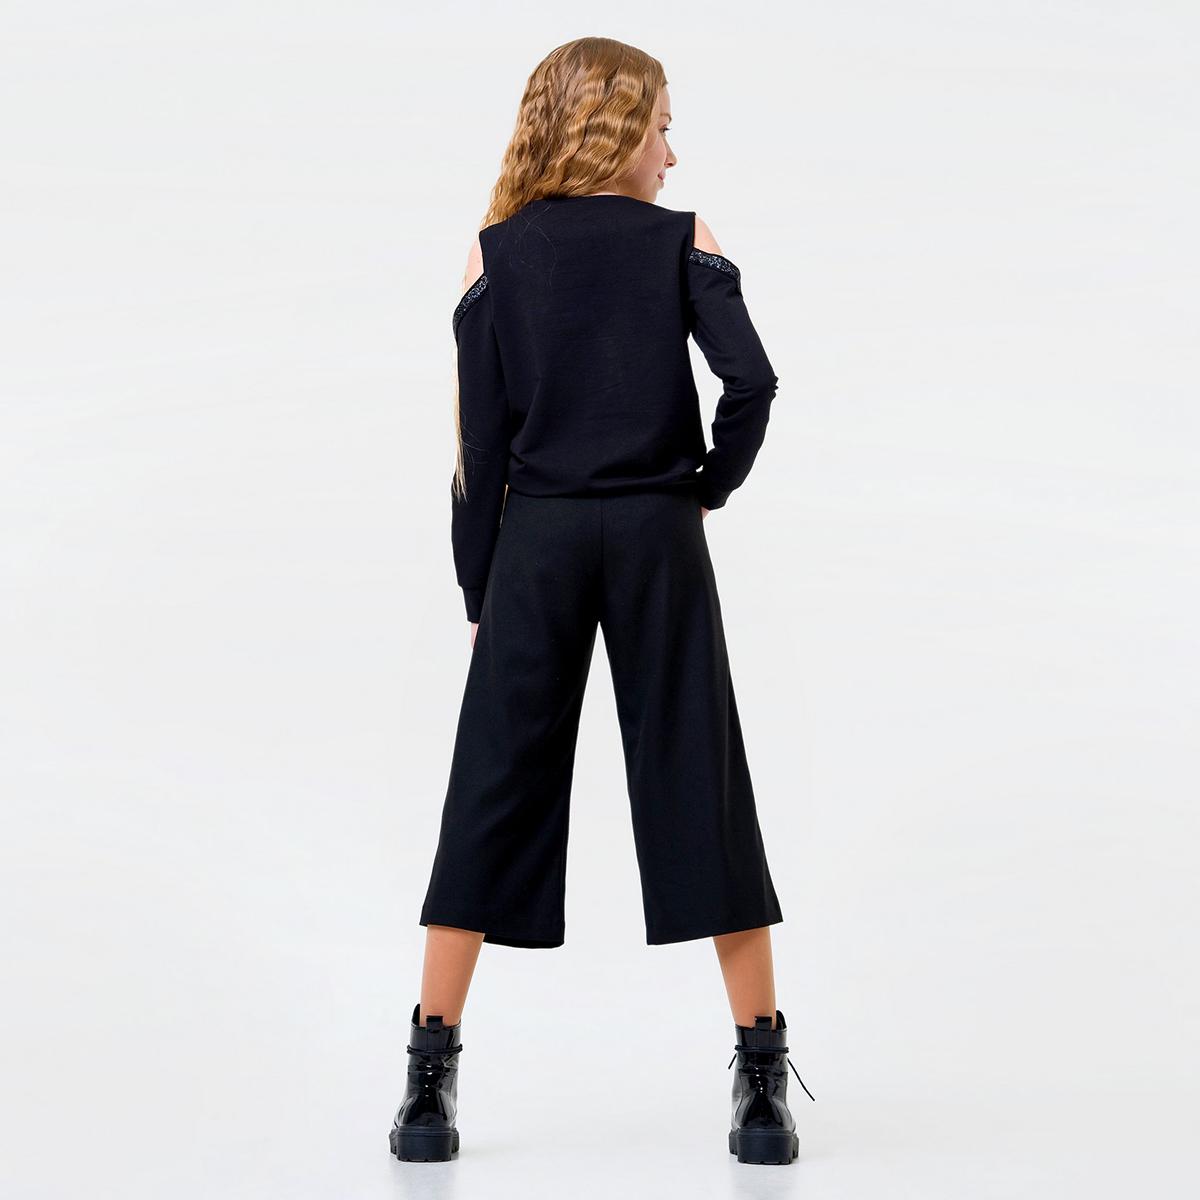 Купить Брюки, джинсы, шорты, Брюки Smil Short Strict Black, р. 128 115434 ТМ: SMIL, черный